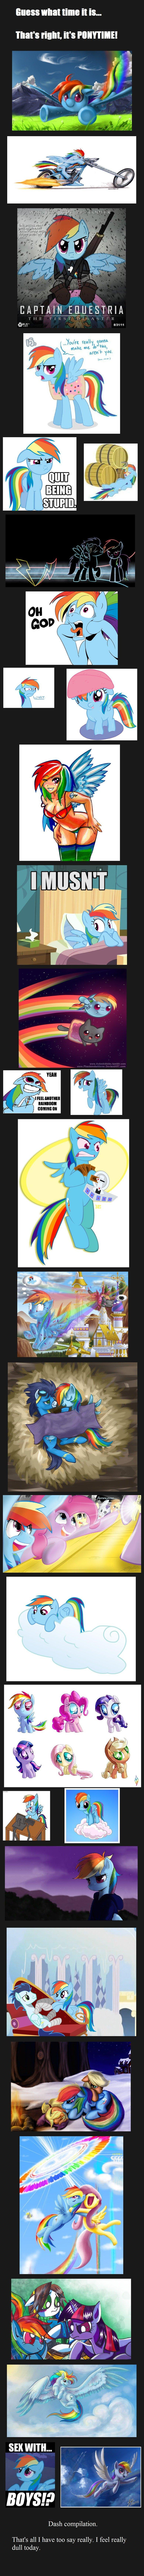 Ponycomp 155. Ponycomp 154: /channel/ponytime/Ponycomp+154/lldcGyy/ DOWNLOAD LINK: www.mediafire.com/?6evo1g2f9lwj1 My DeviantART: . My Little Pony ponies ponytime